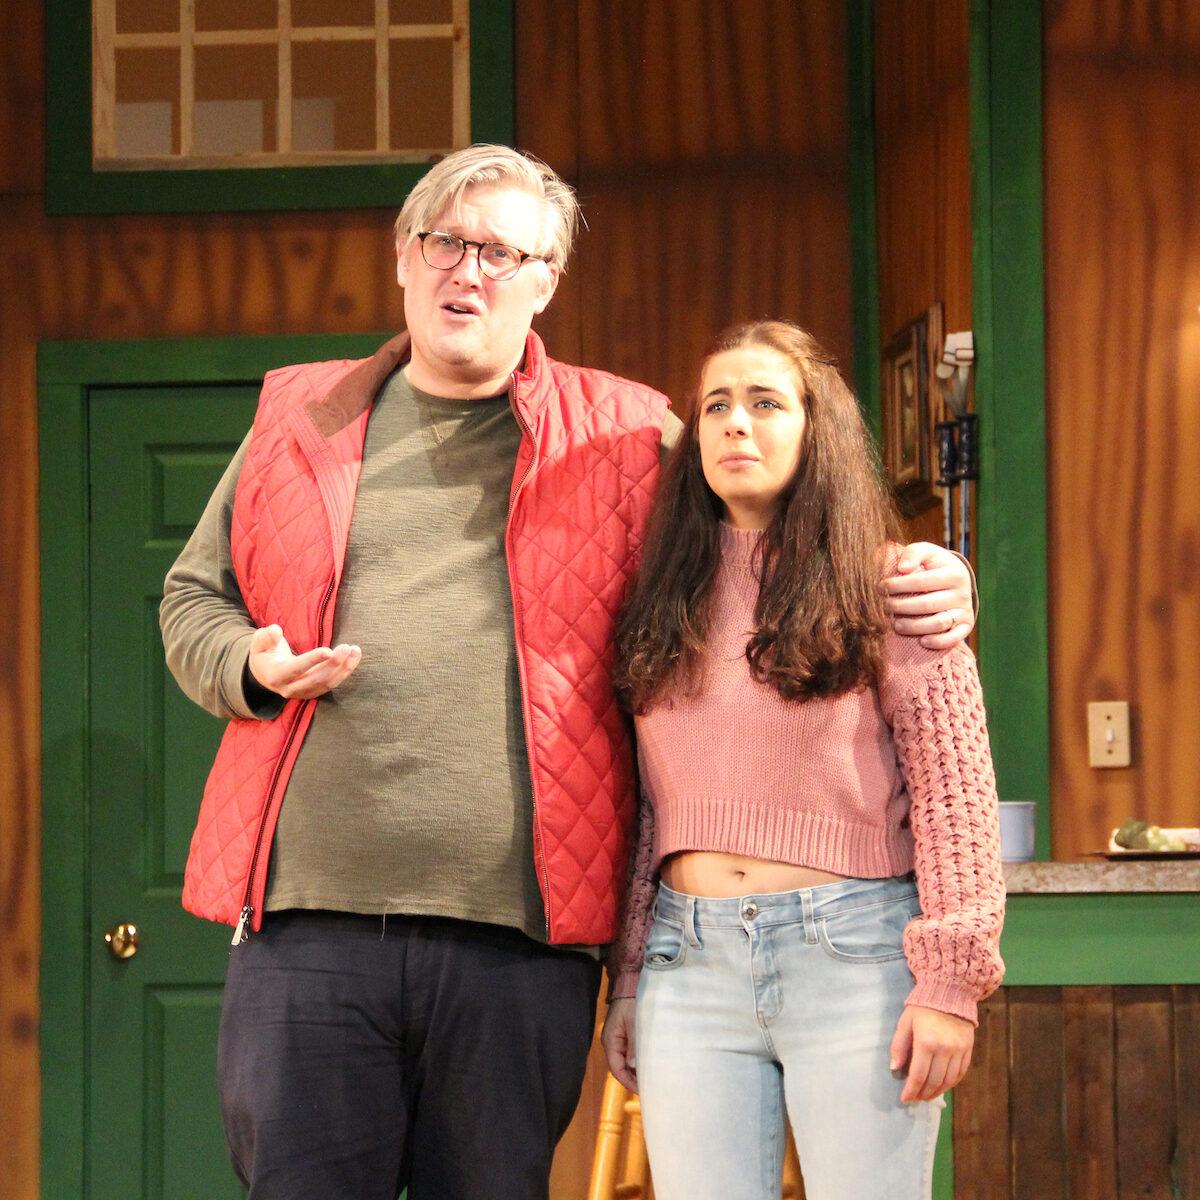 Patrick Hunter_Lexi Pinnata IN A SLIPPERY SLOPE - Barn Theatre School